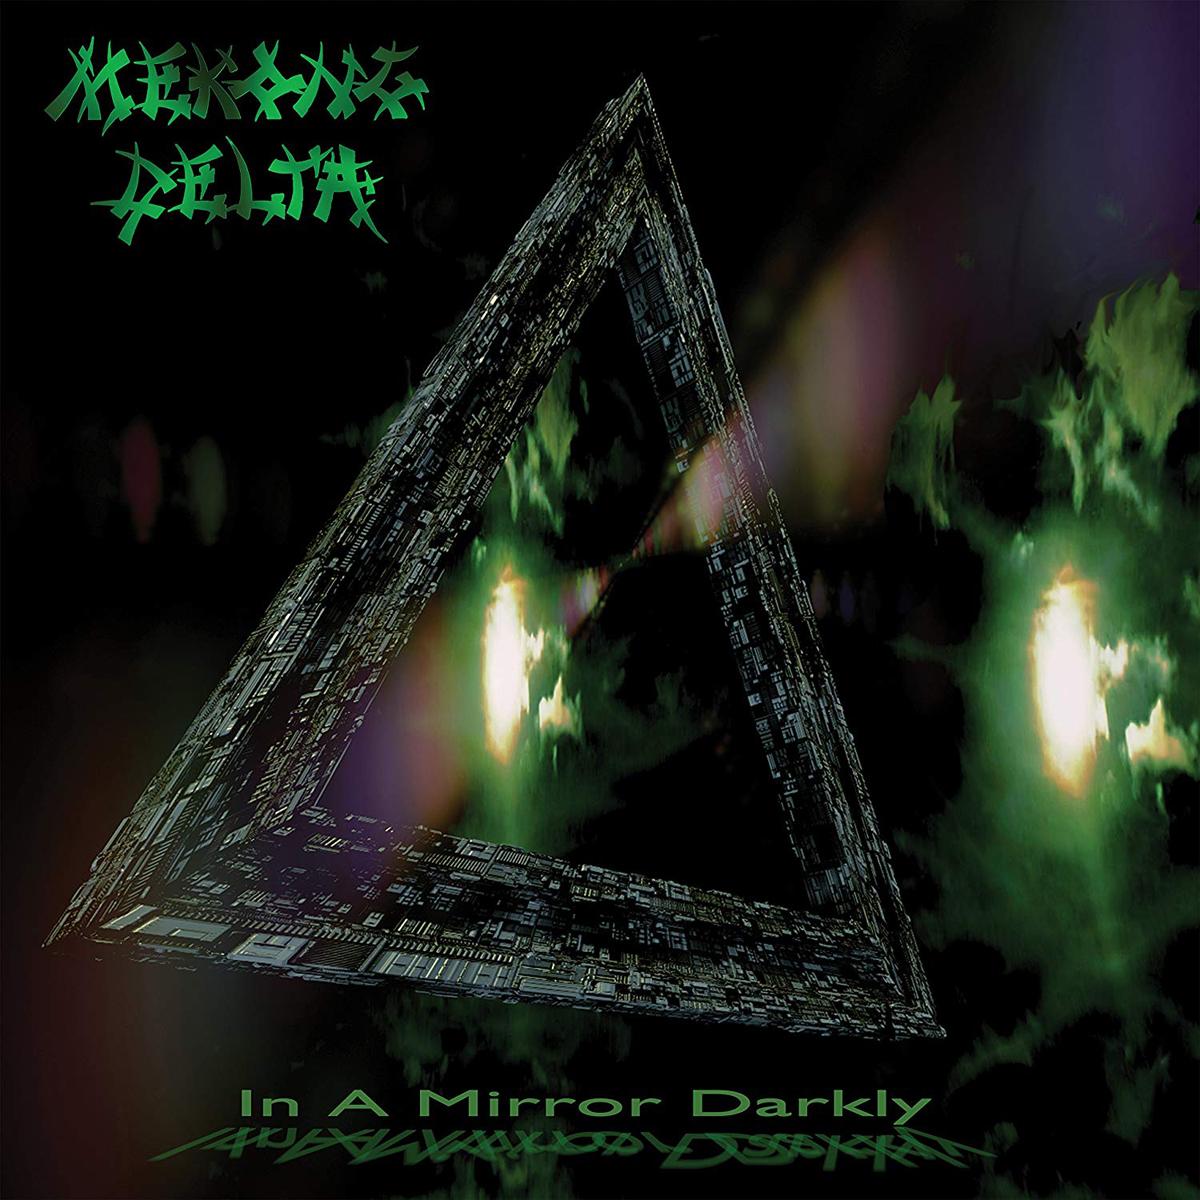 цена на Меконк Дельта Mekong Delta. In A Mirror Darkly